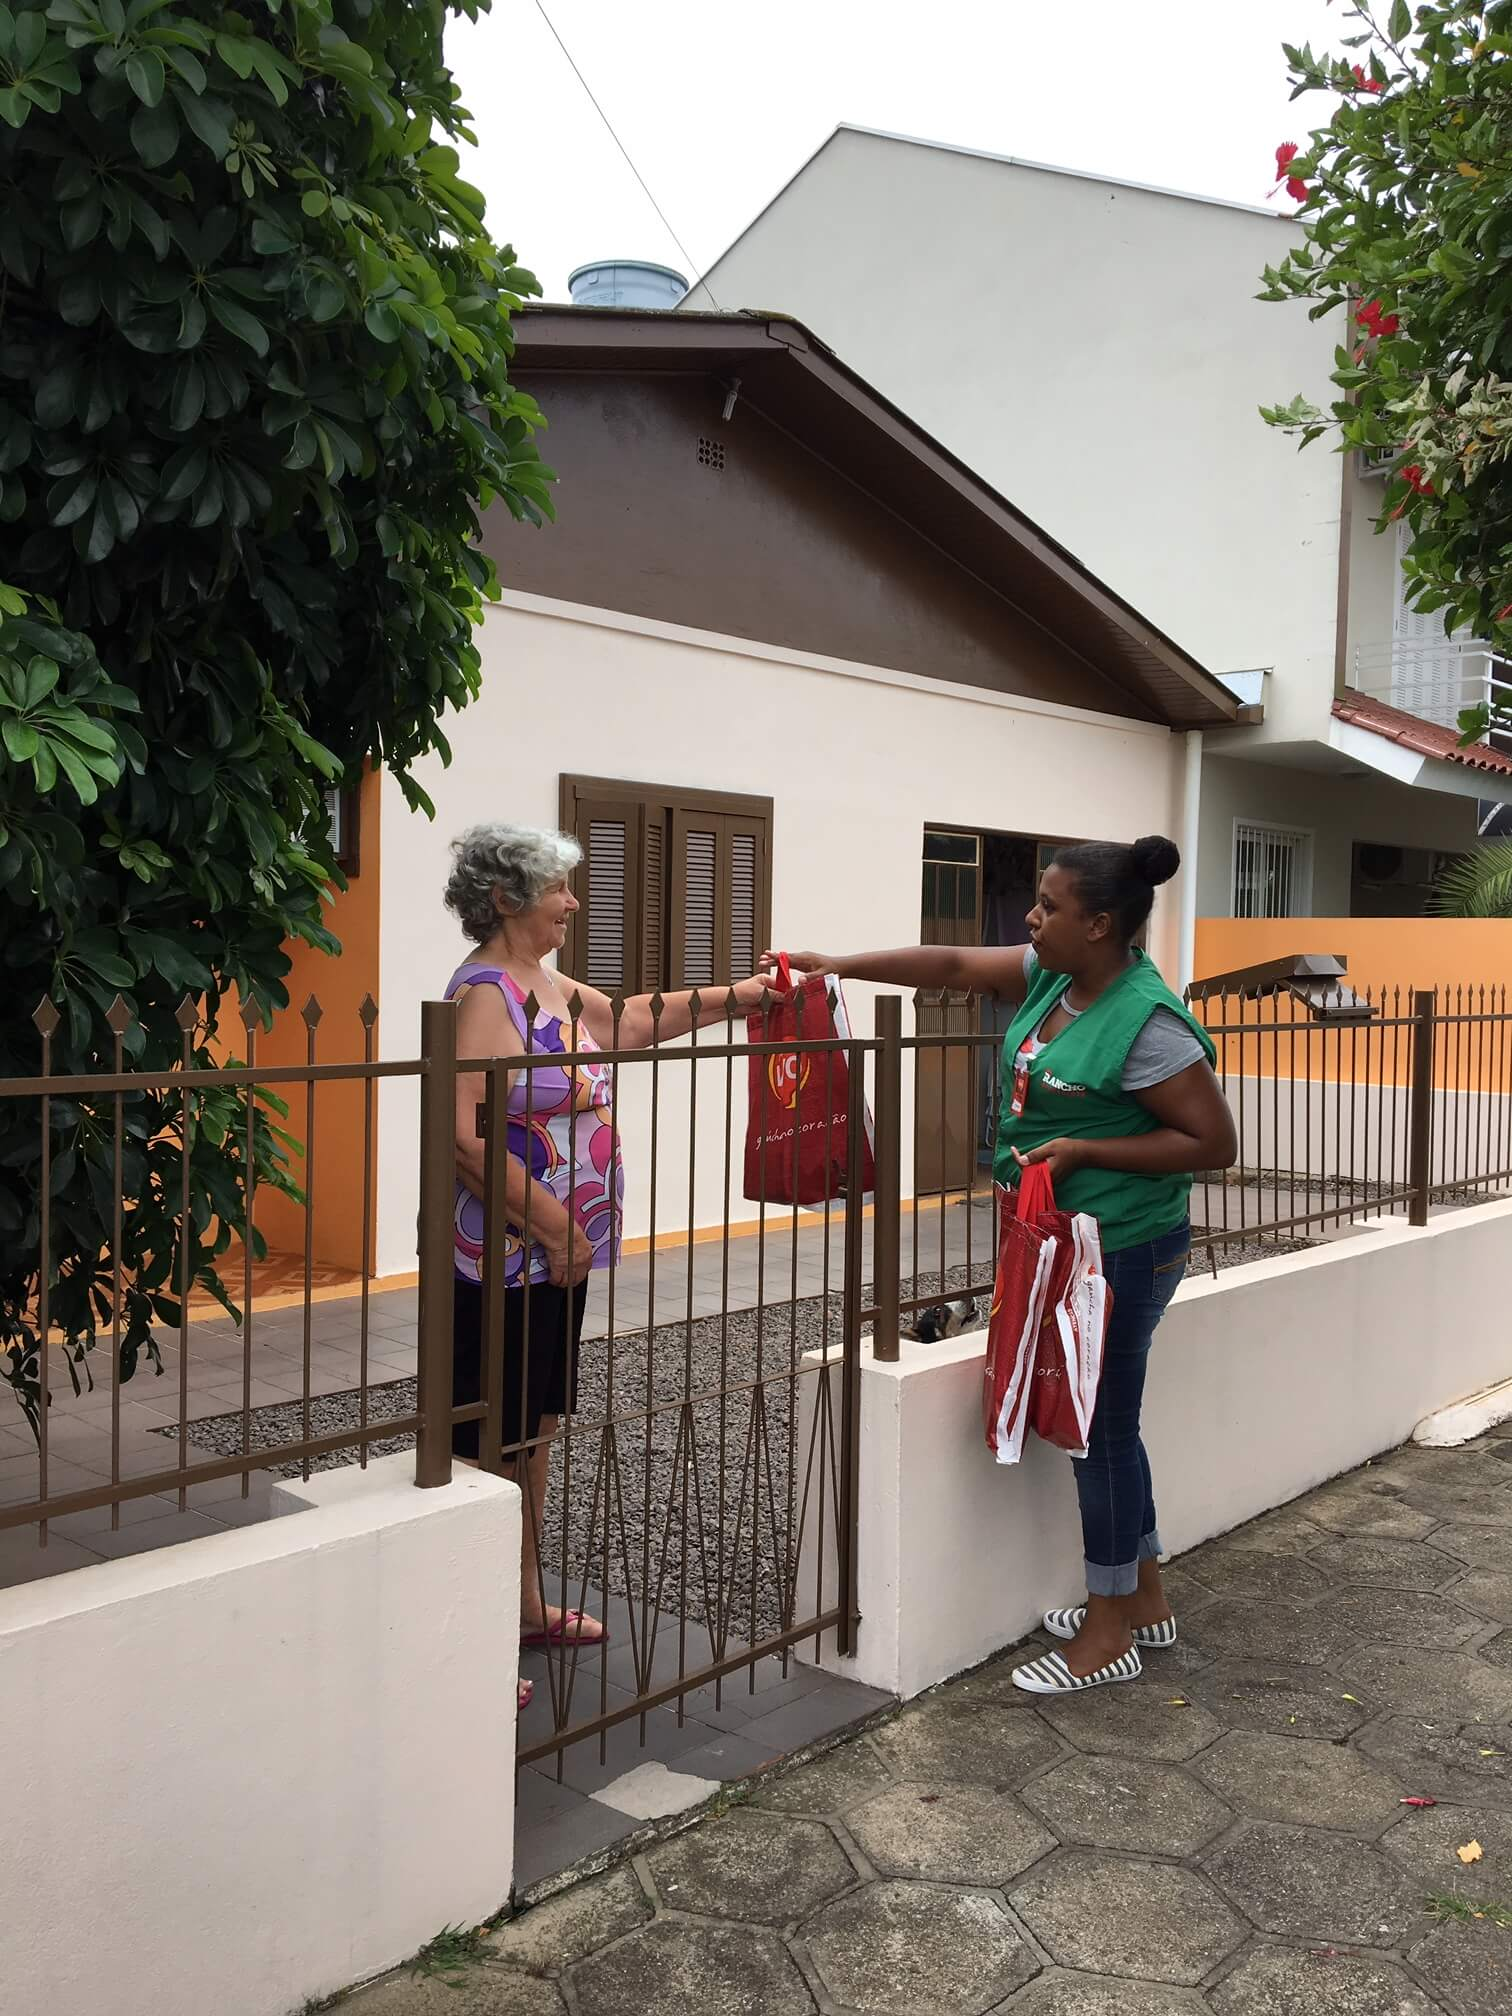 Visita aos vizinhos